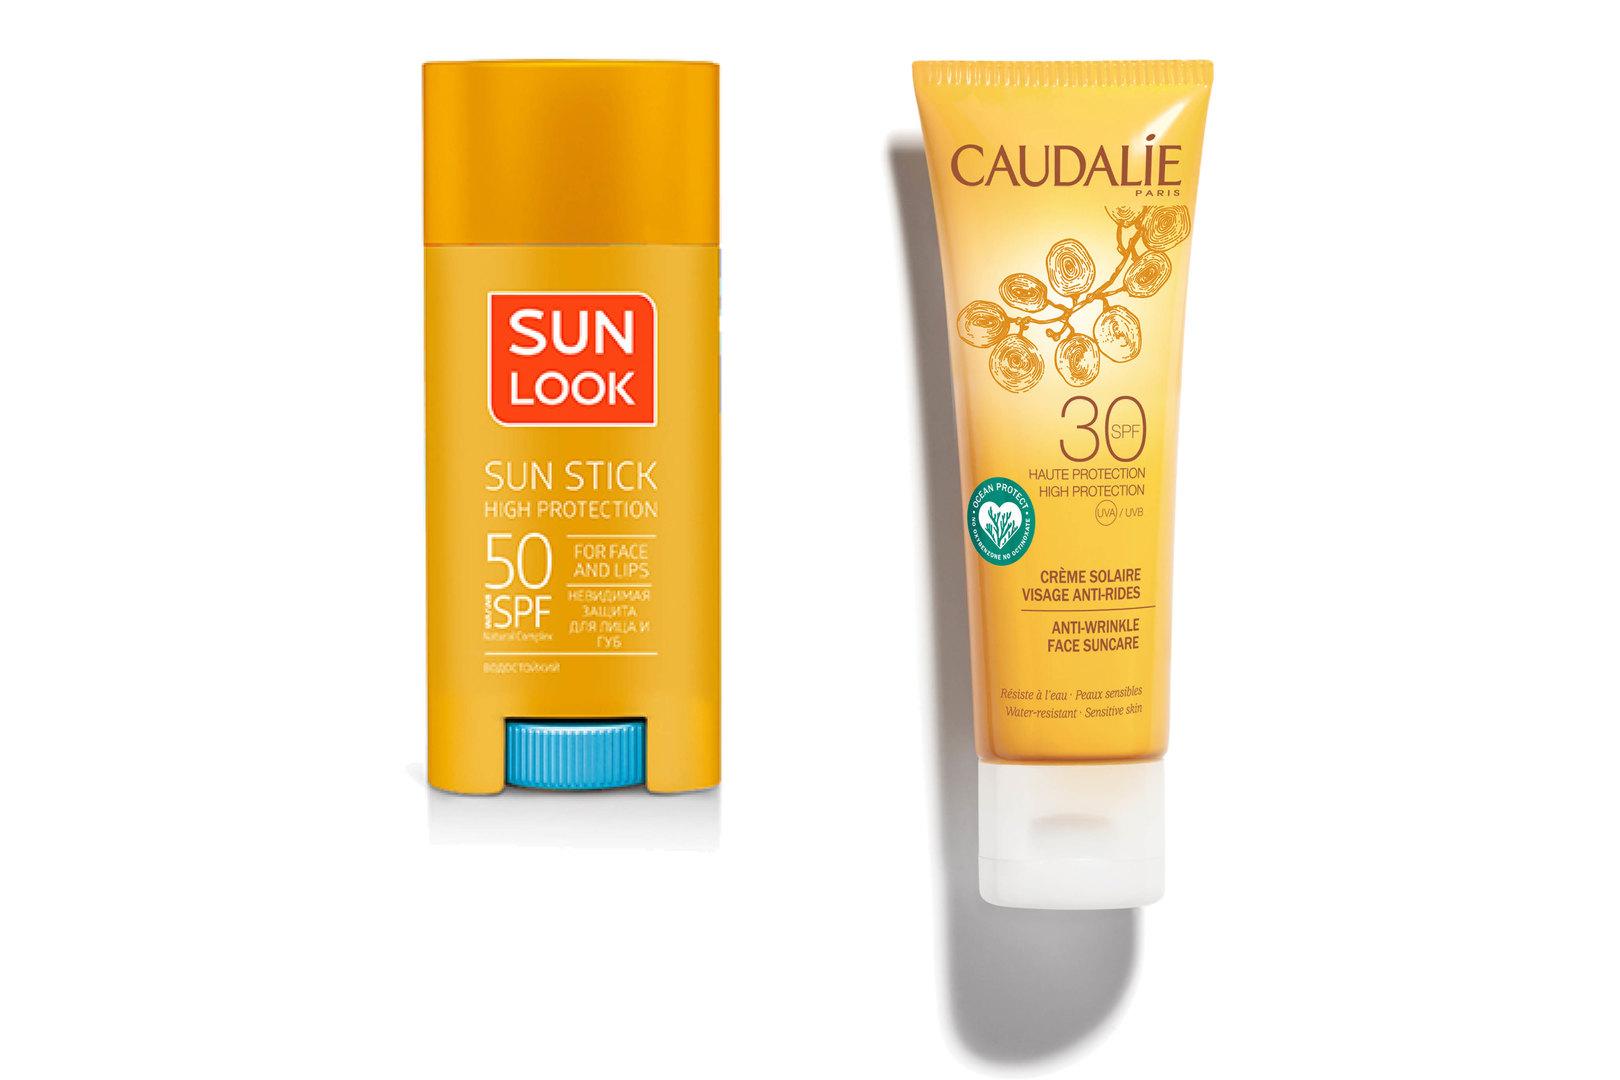 Солнцезащитный стик длялица игуб SPF 50, Sun Look; Солнцезащитный крем длялица против морщин SPF 30, Caudalie